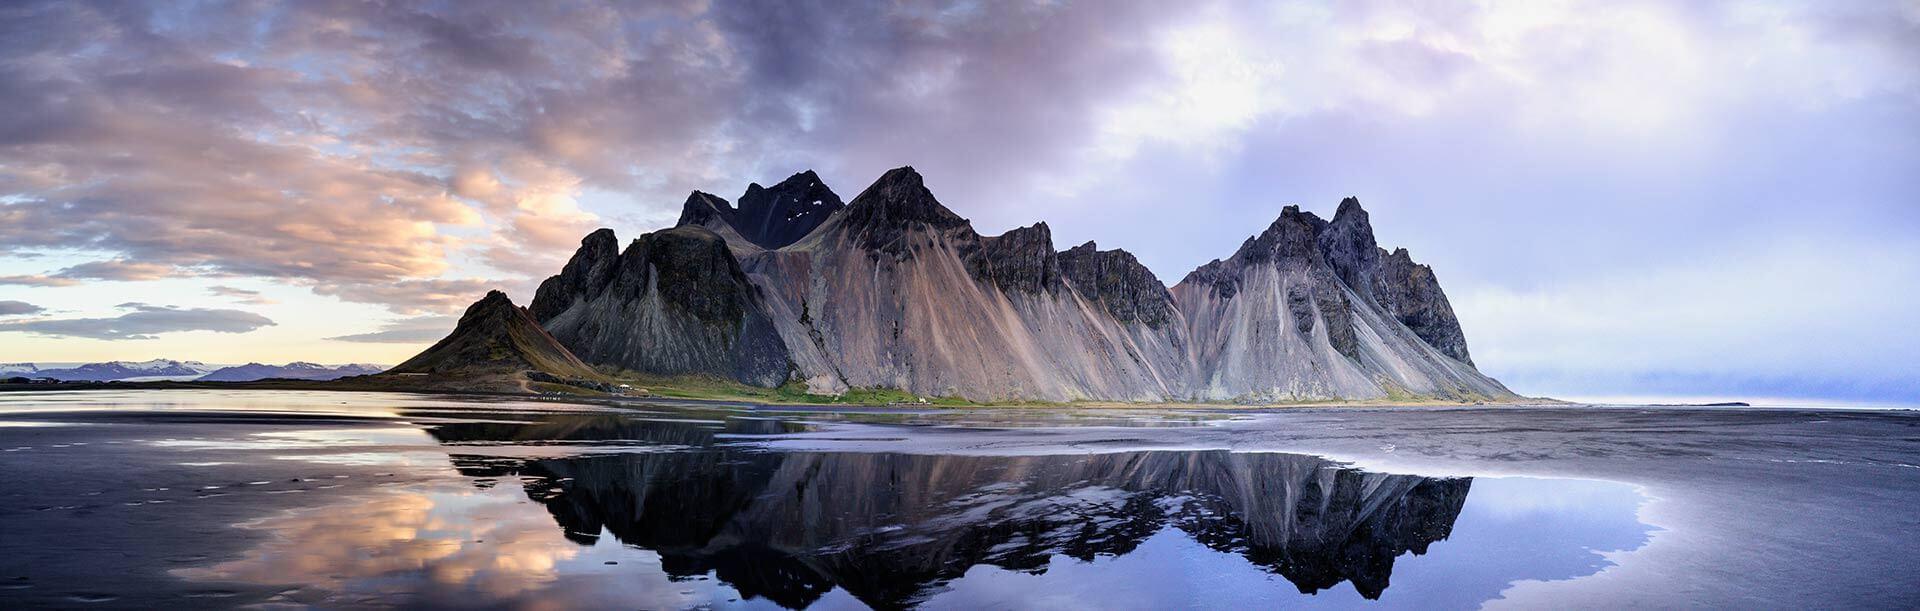 Rondreis IJsland